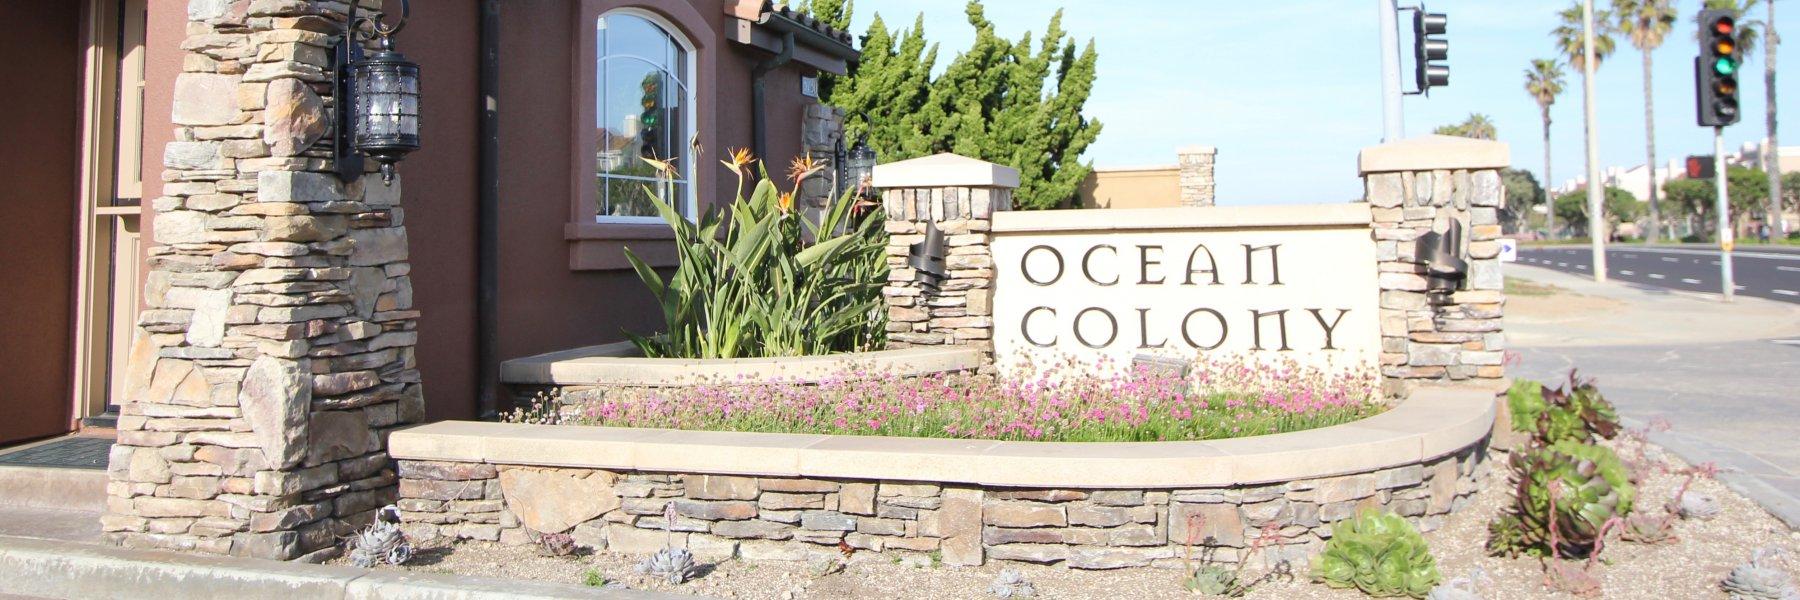 Ocean Colony is a community of homes in Huntington Beach California